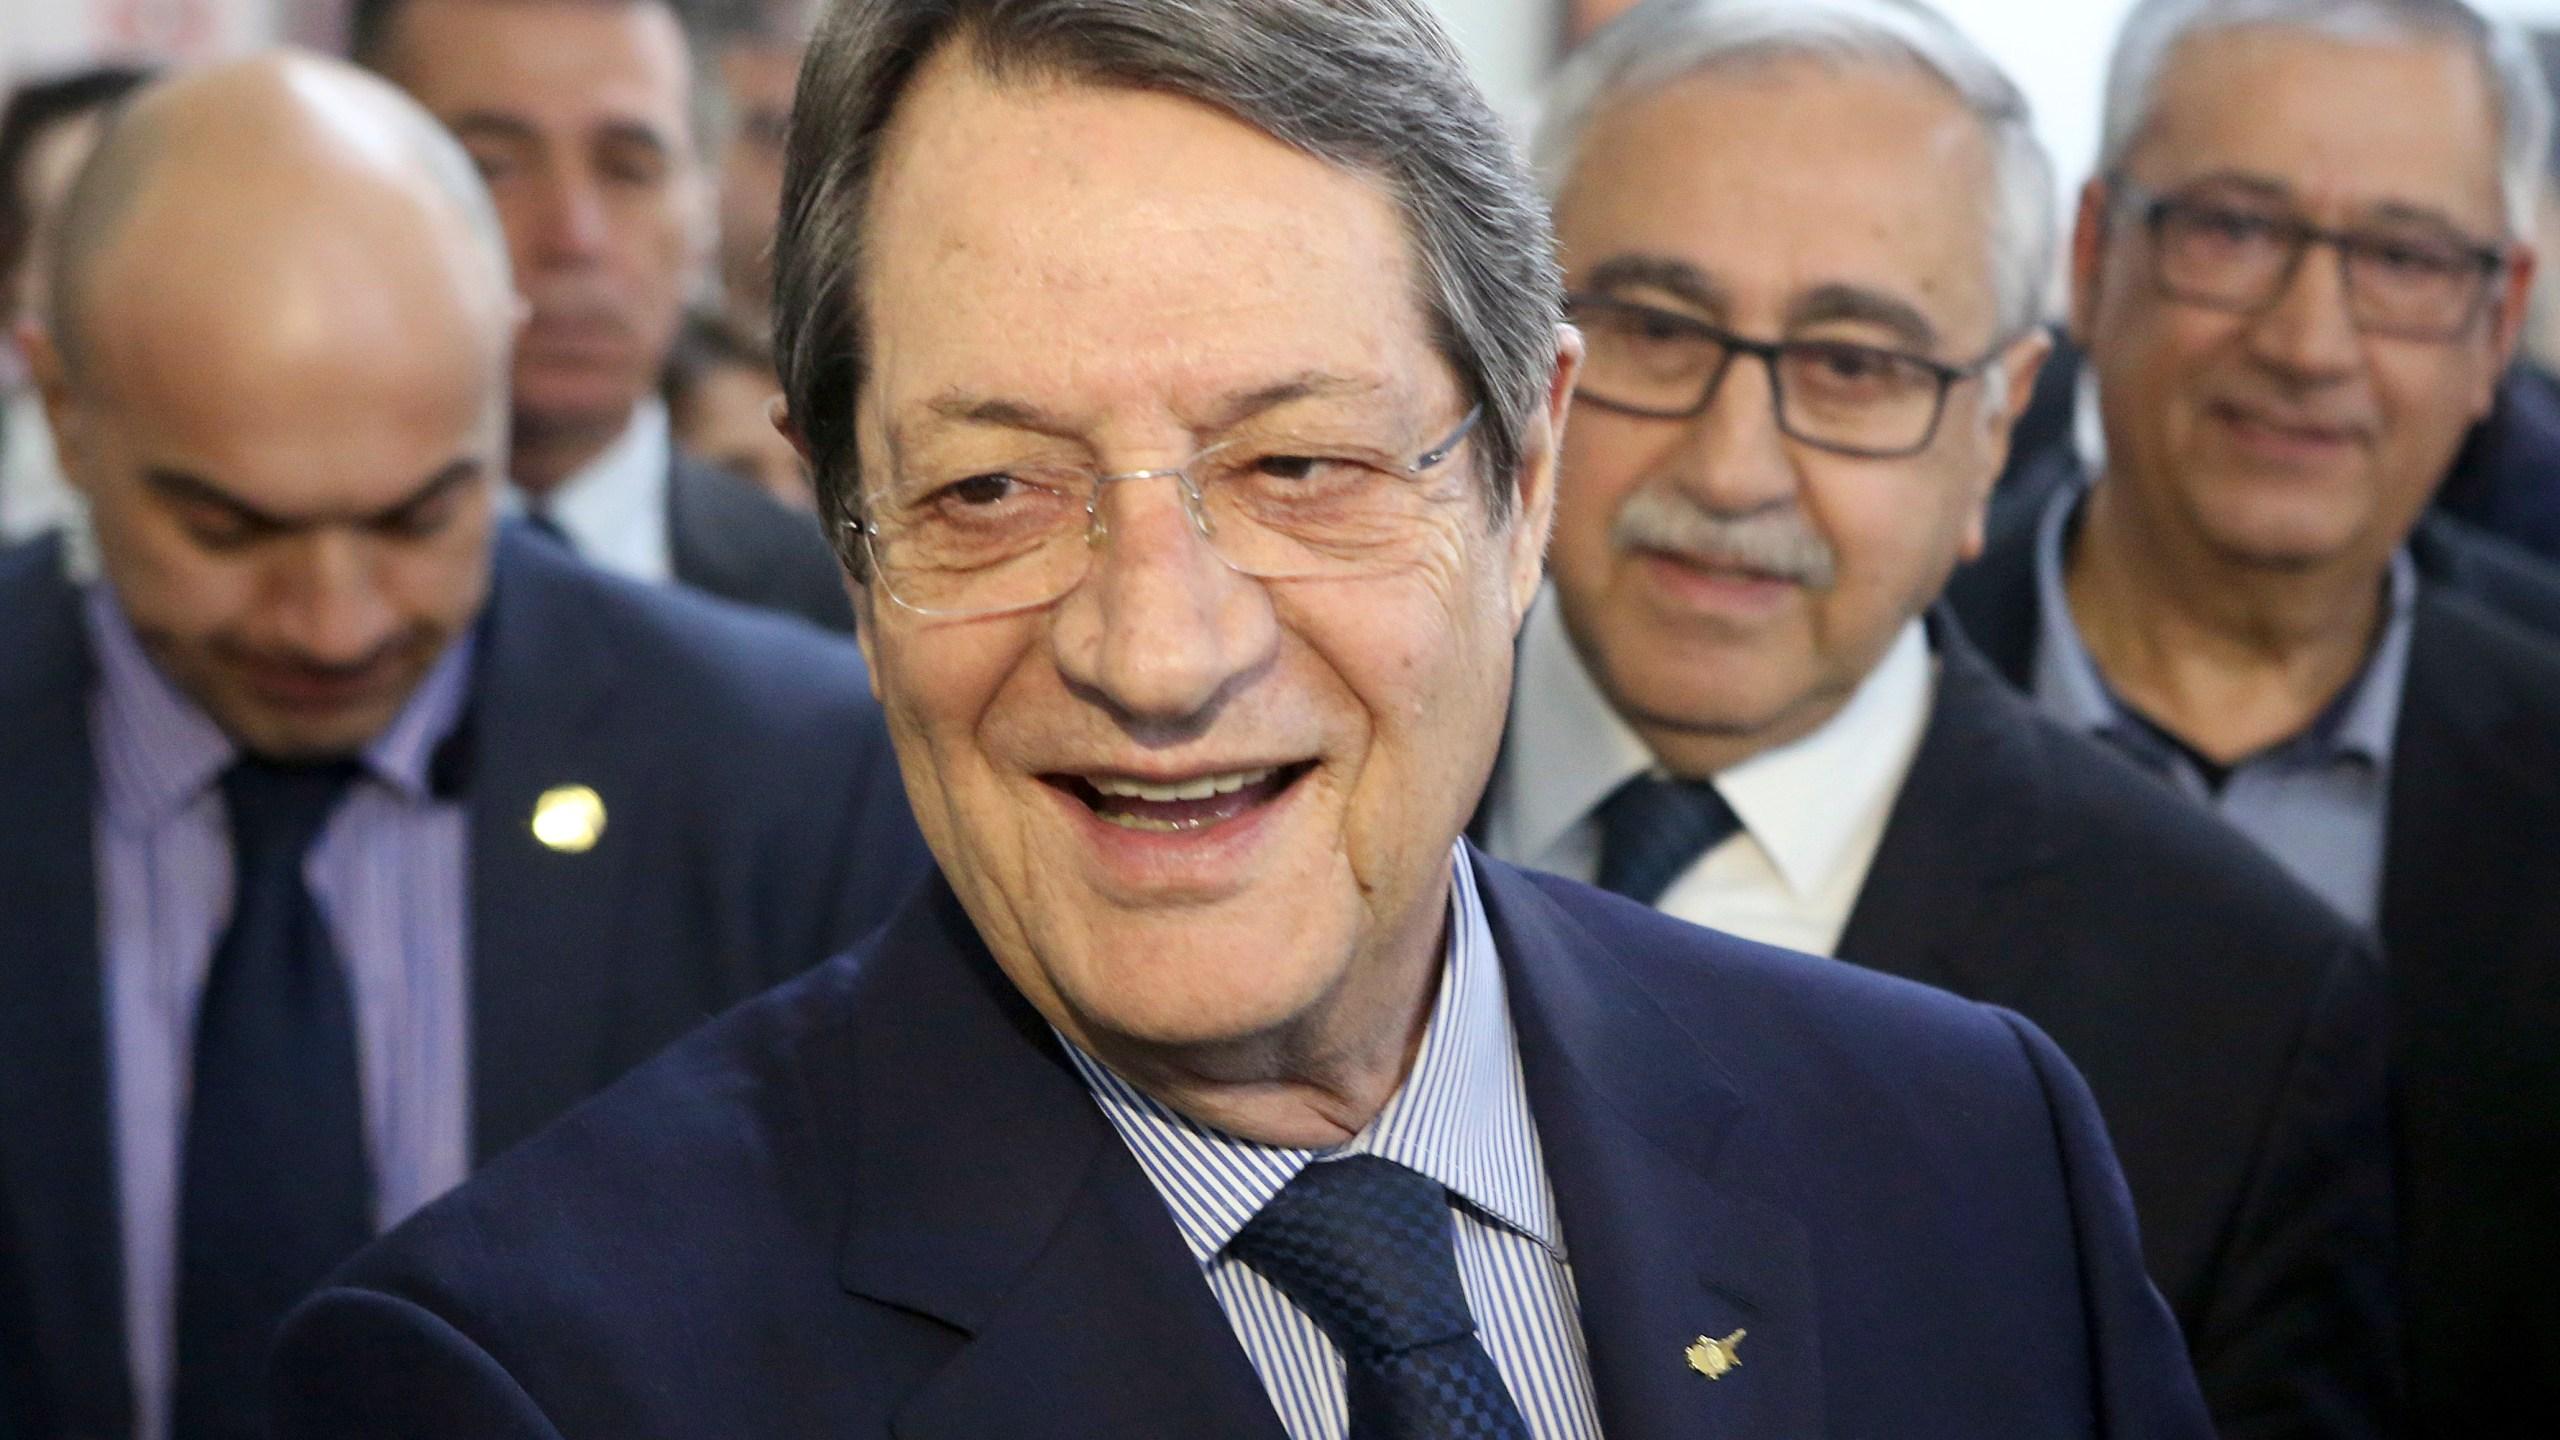 Nicos Anastasiades, Mustafa Akinc